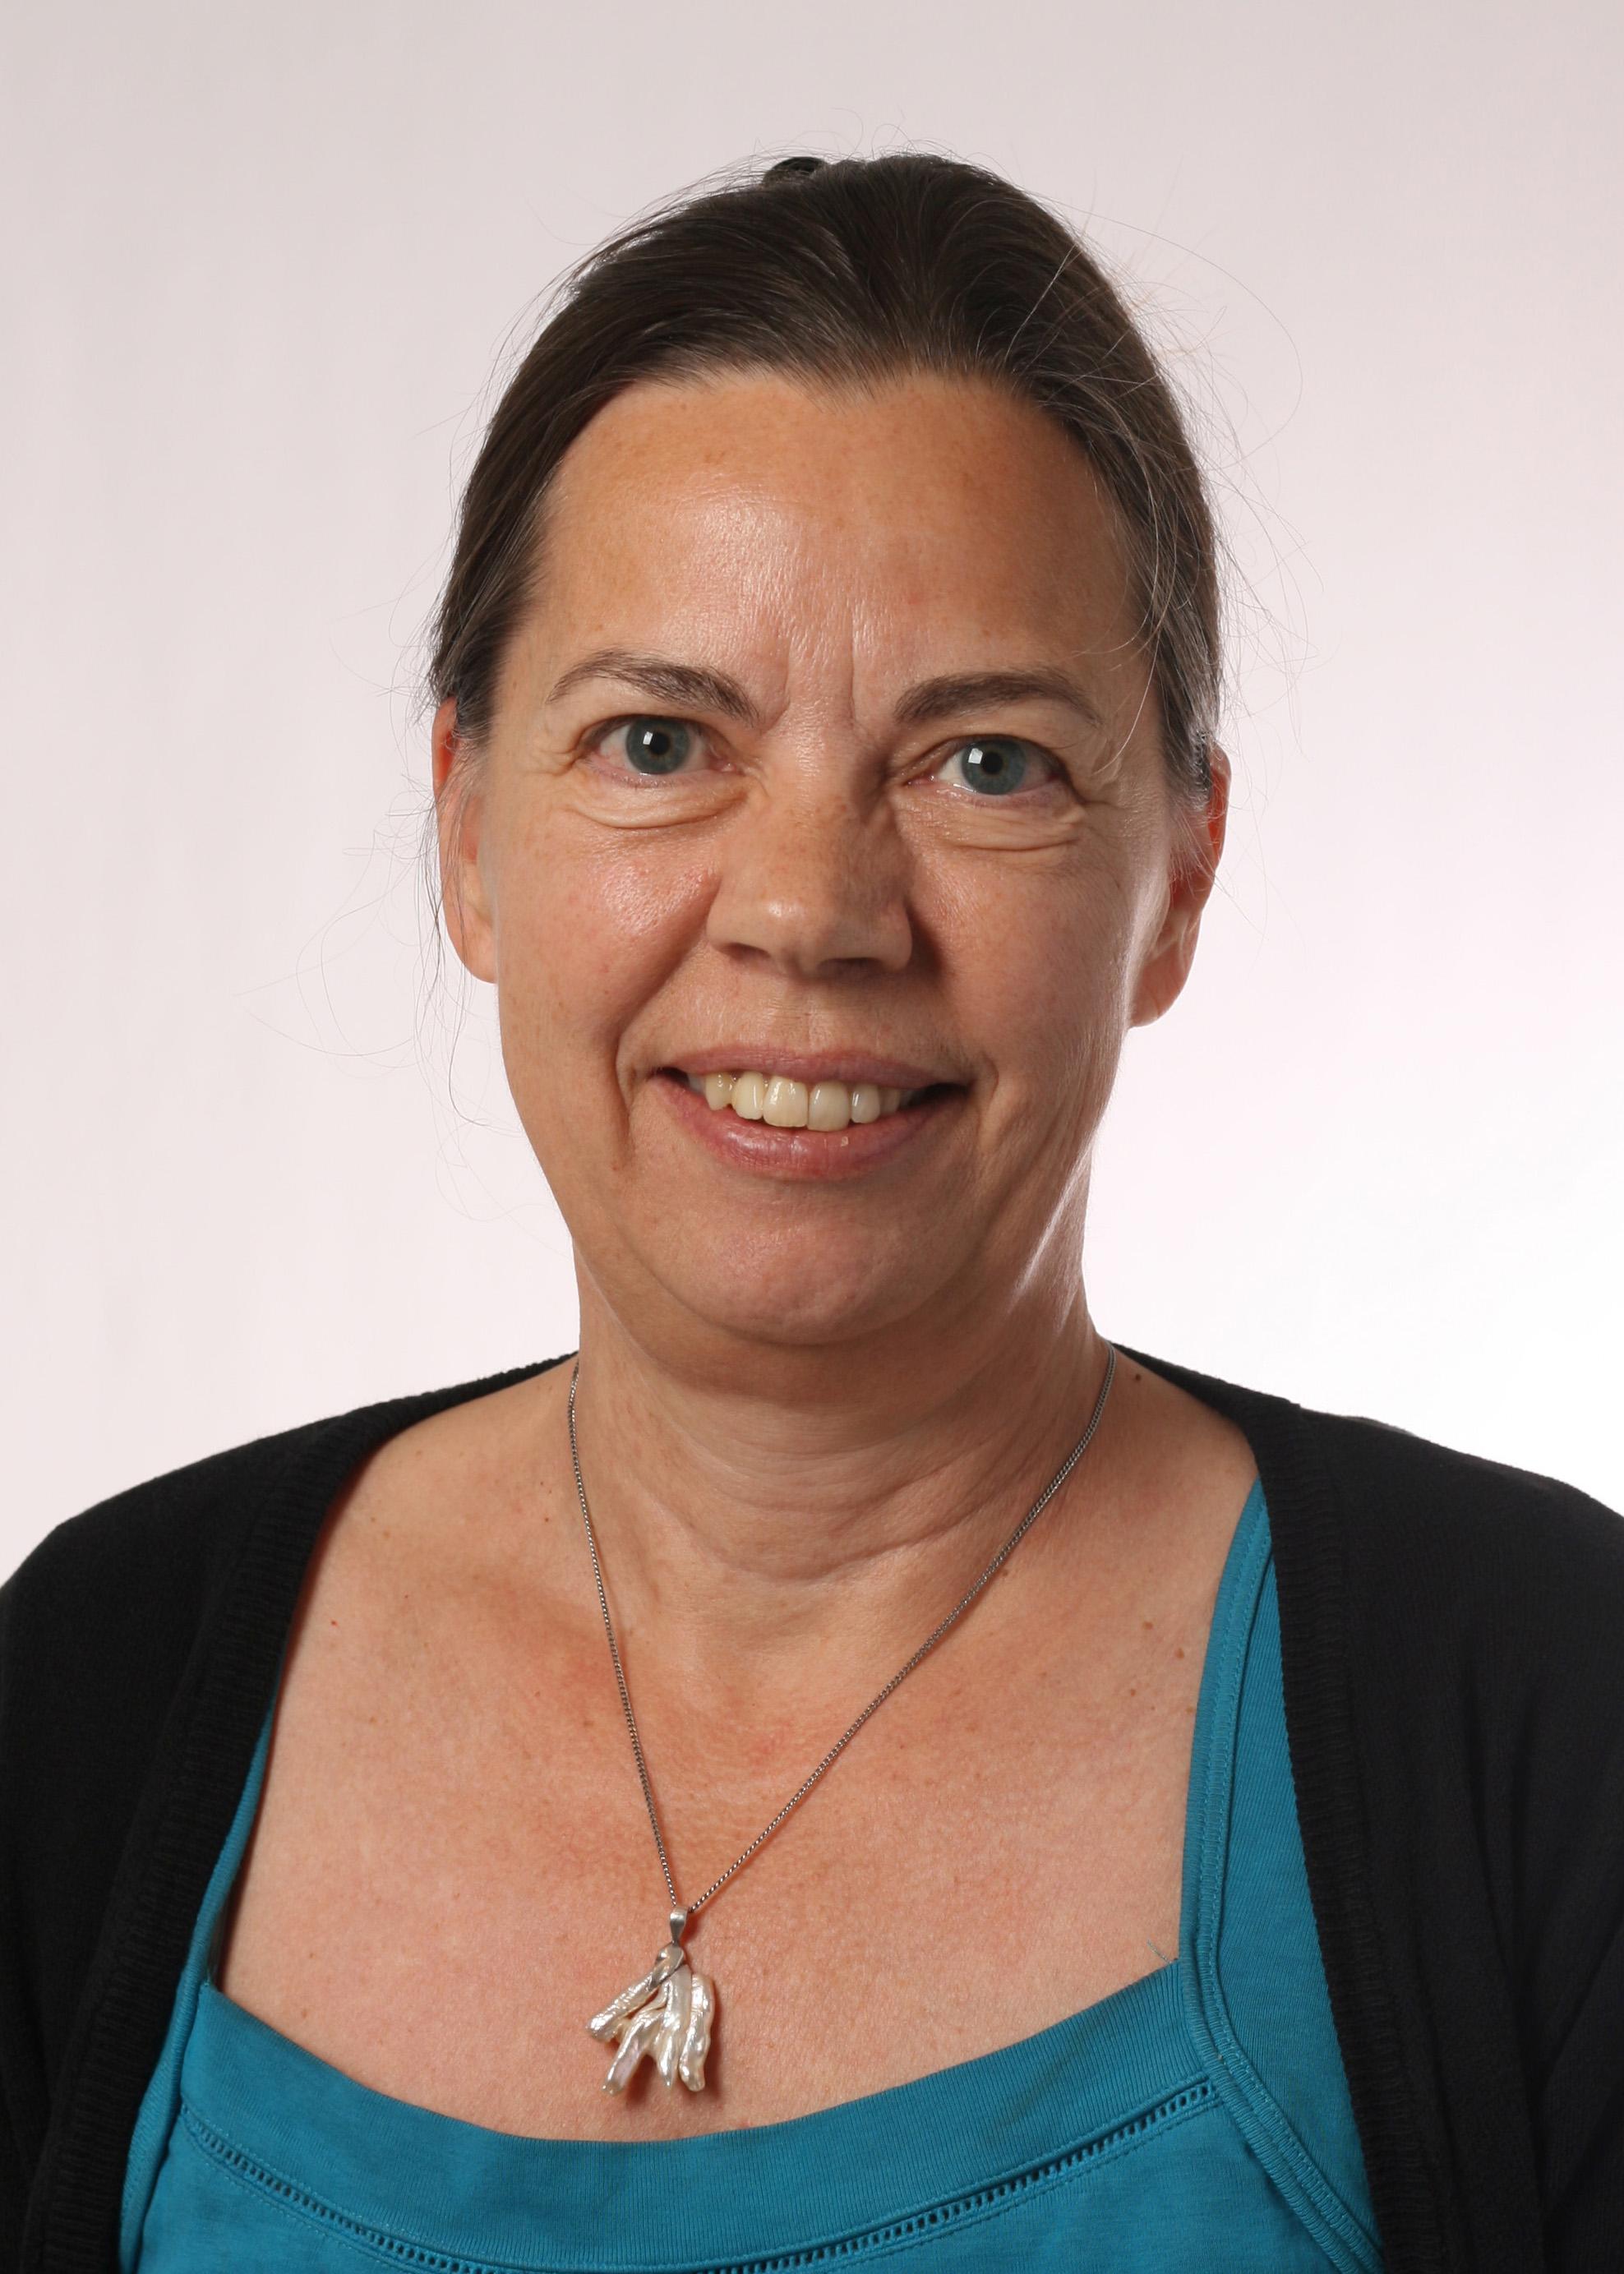 Pia Møller Martensen